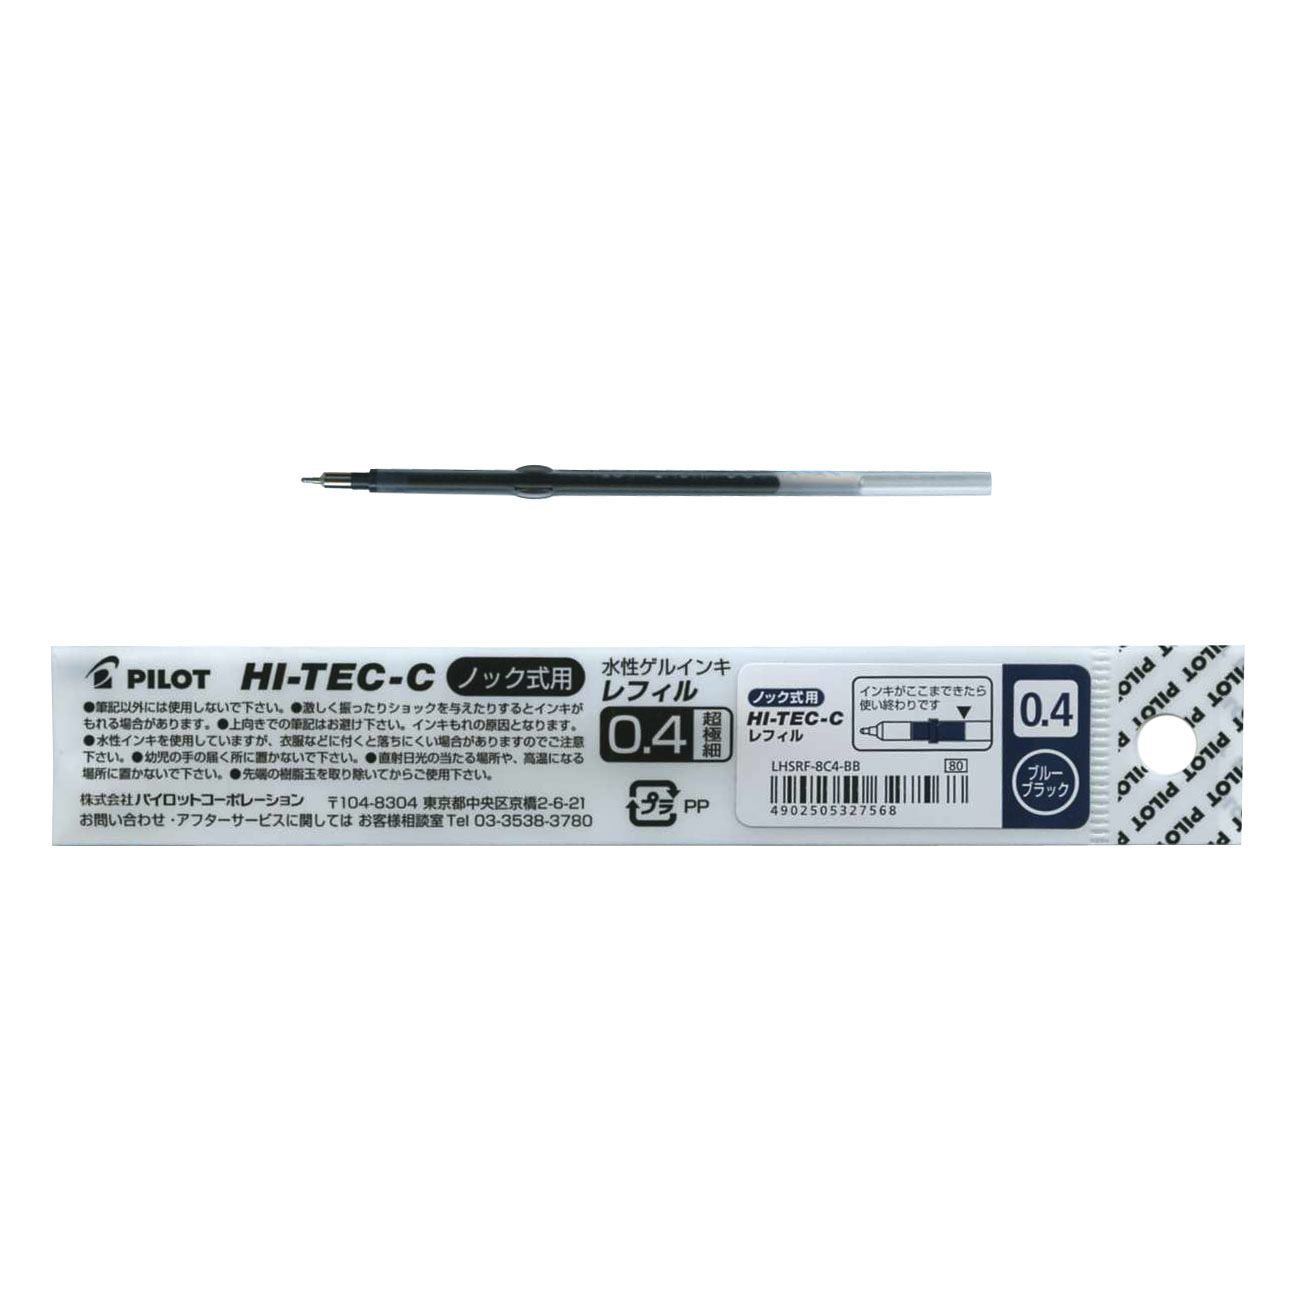 Pilot Hi-Tec-C Slim Knock Ballpoint Pen Refill 0.4m [01GR0CV8]